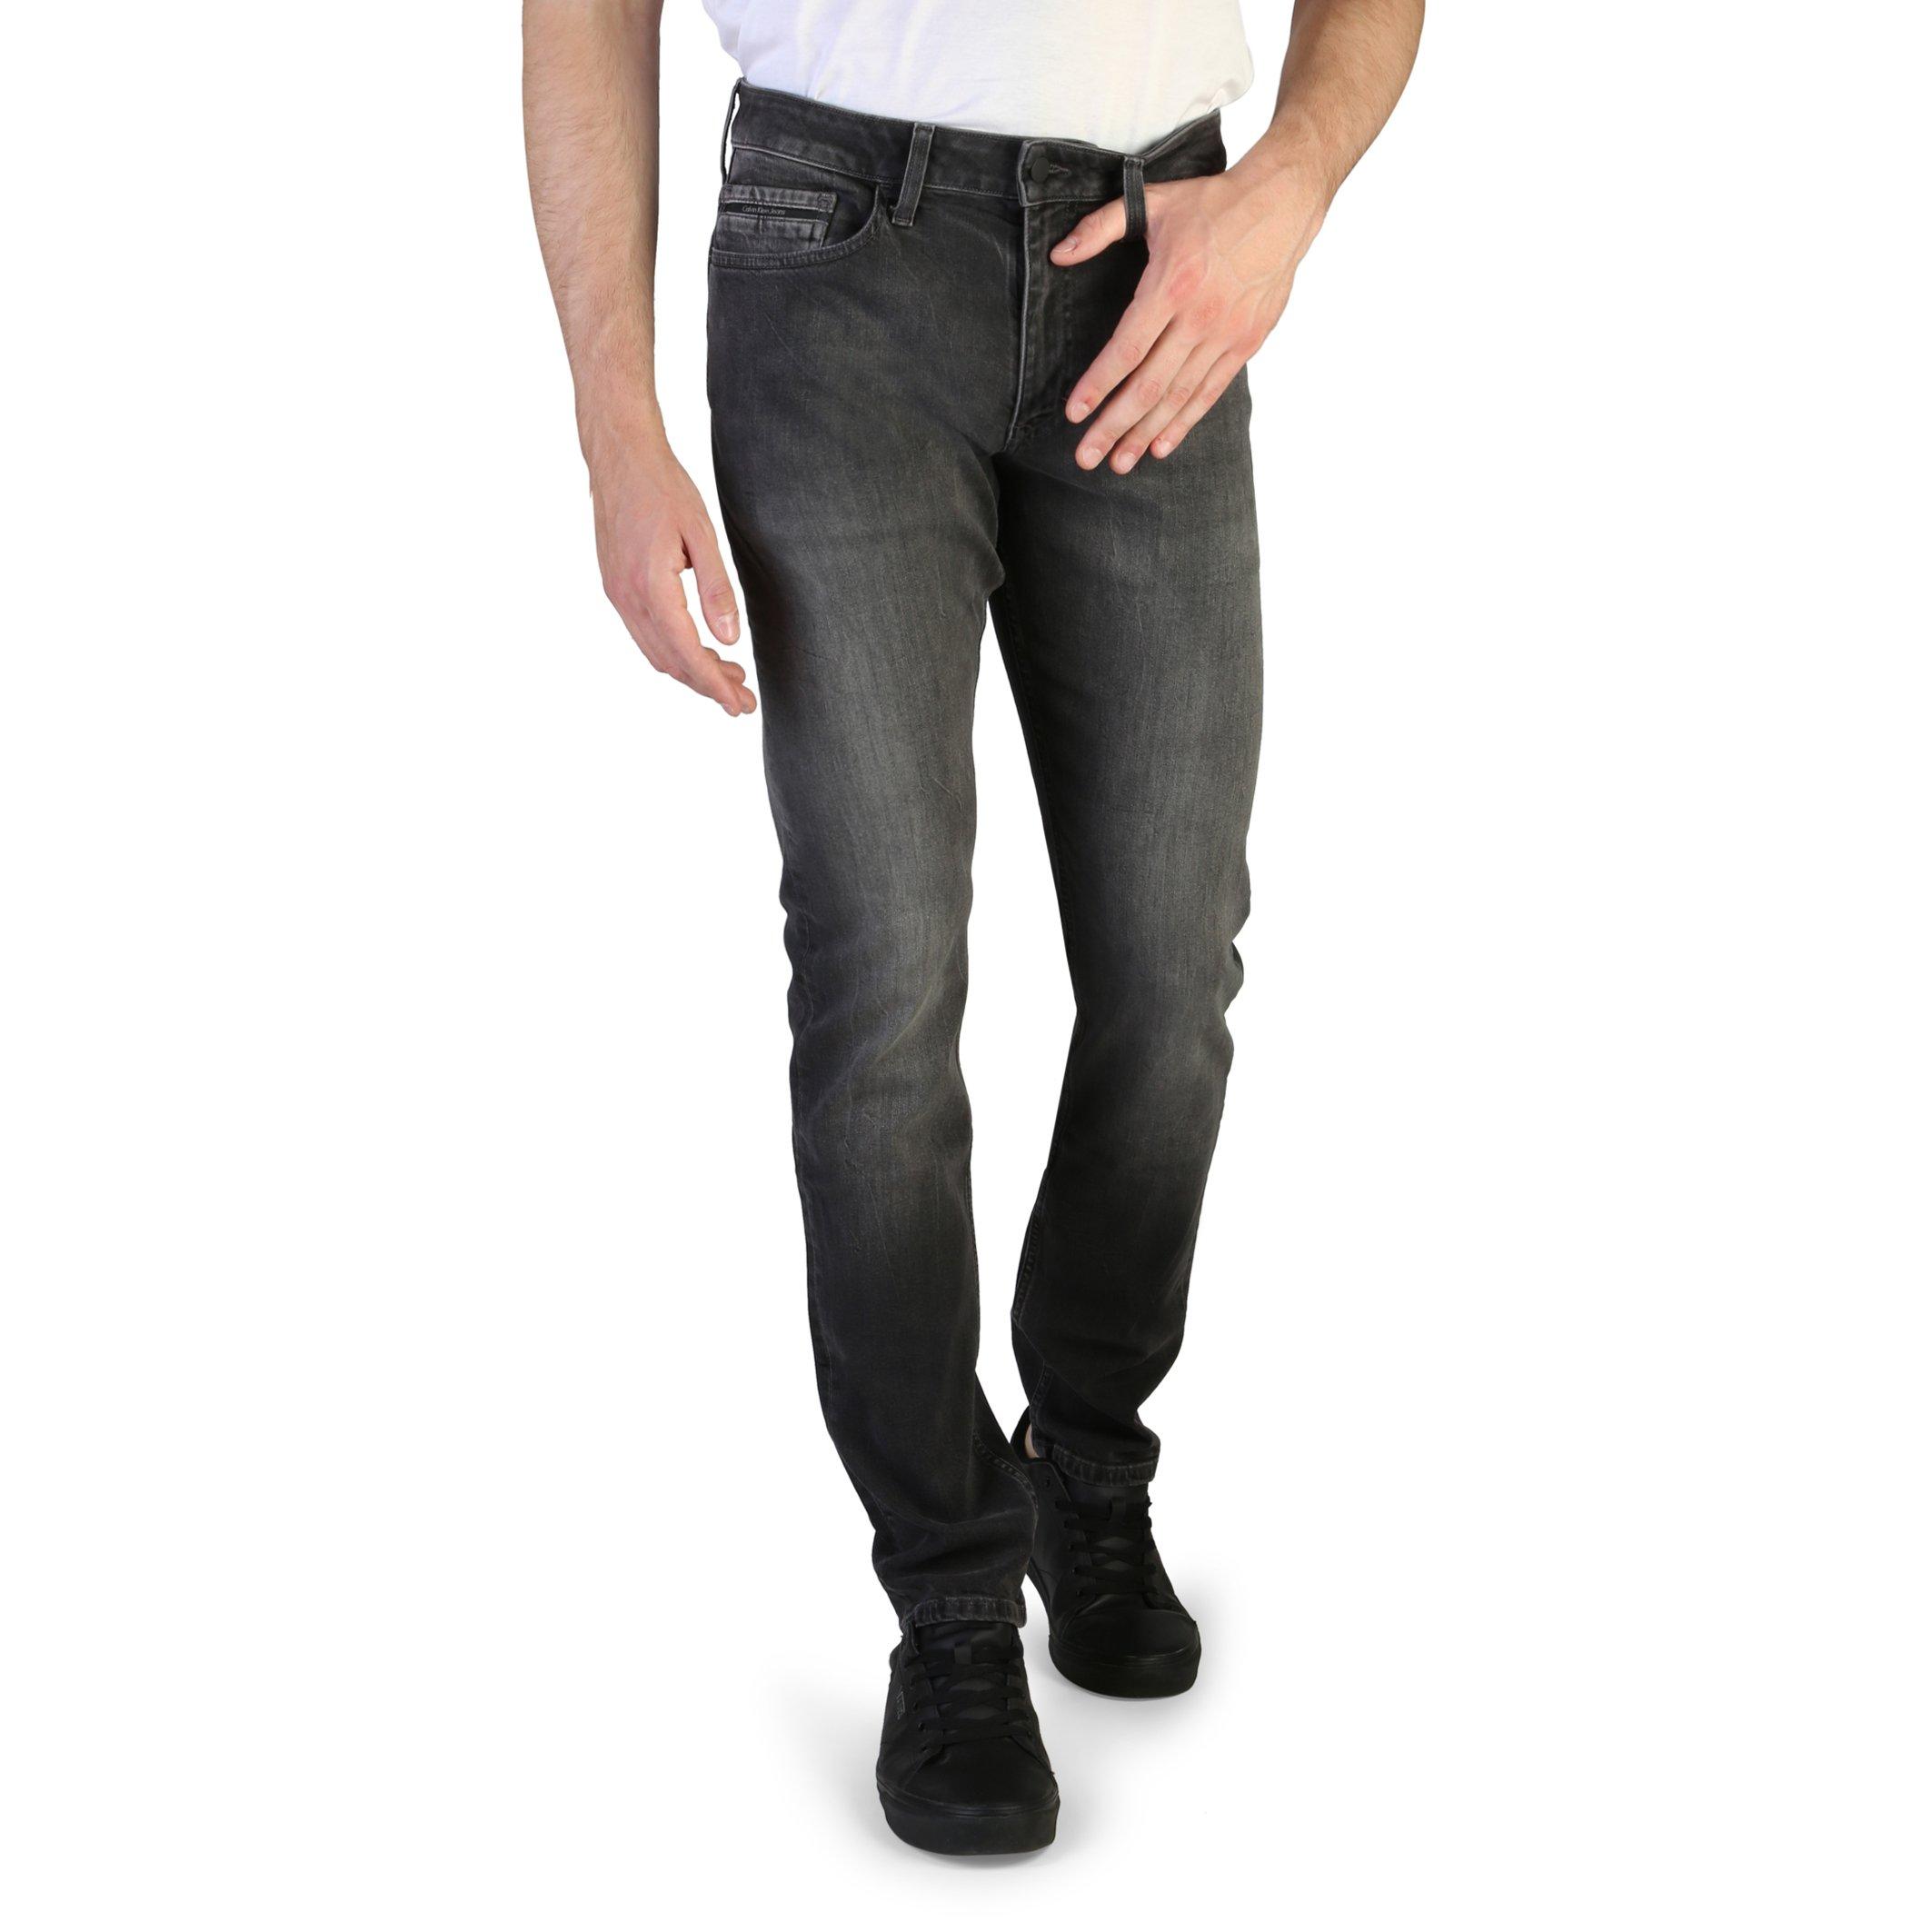 Calvin Klein Men's Jeans Grey J30J305762 - grey-1 28